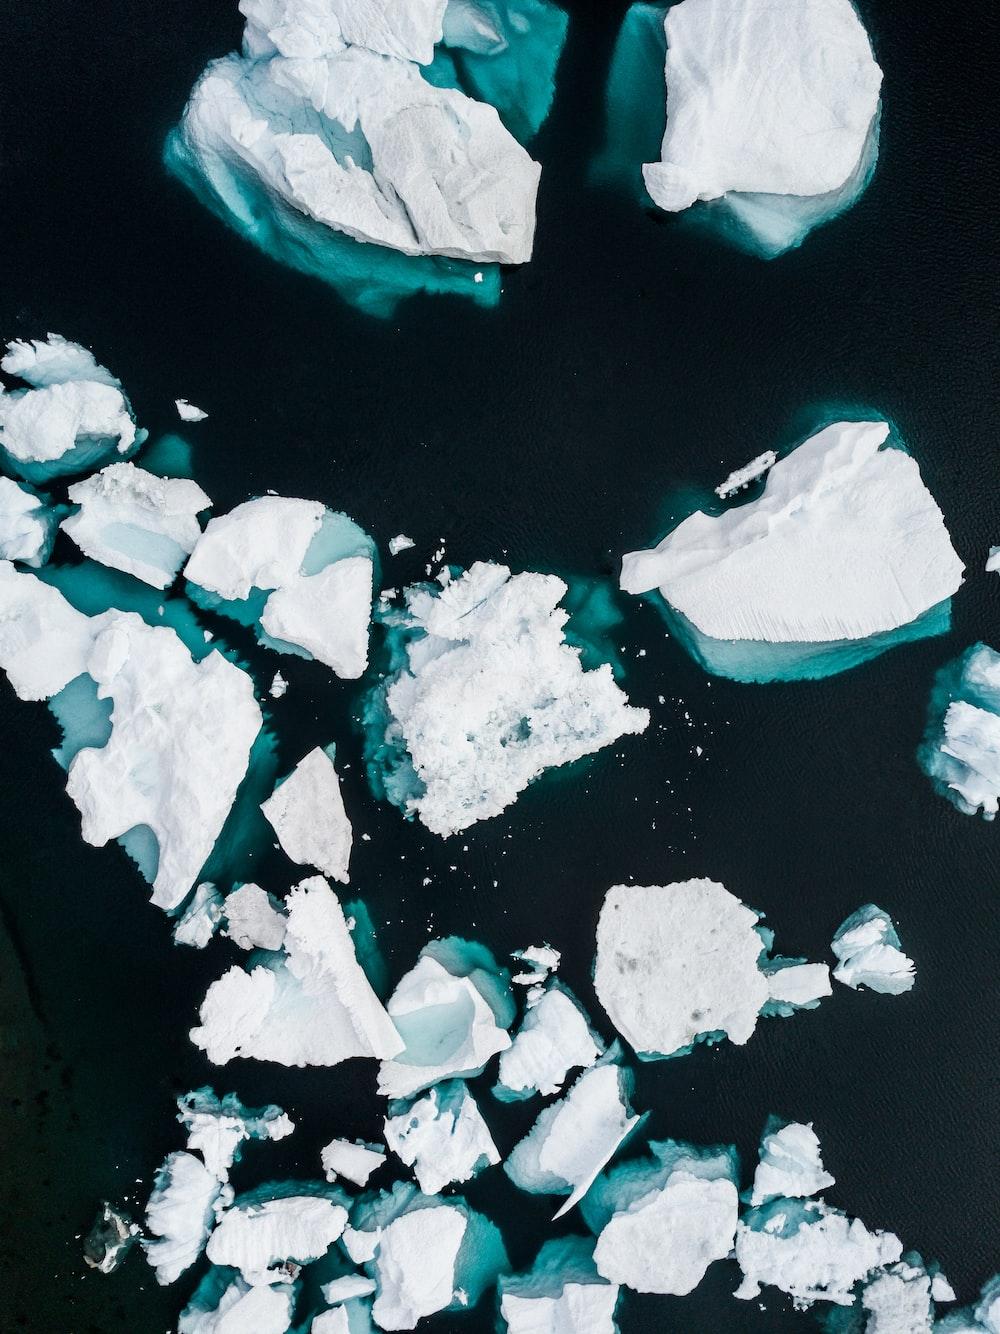 ice bergs display